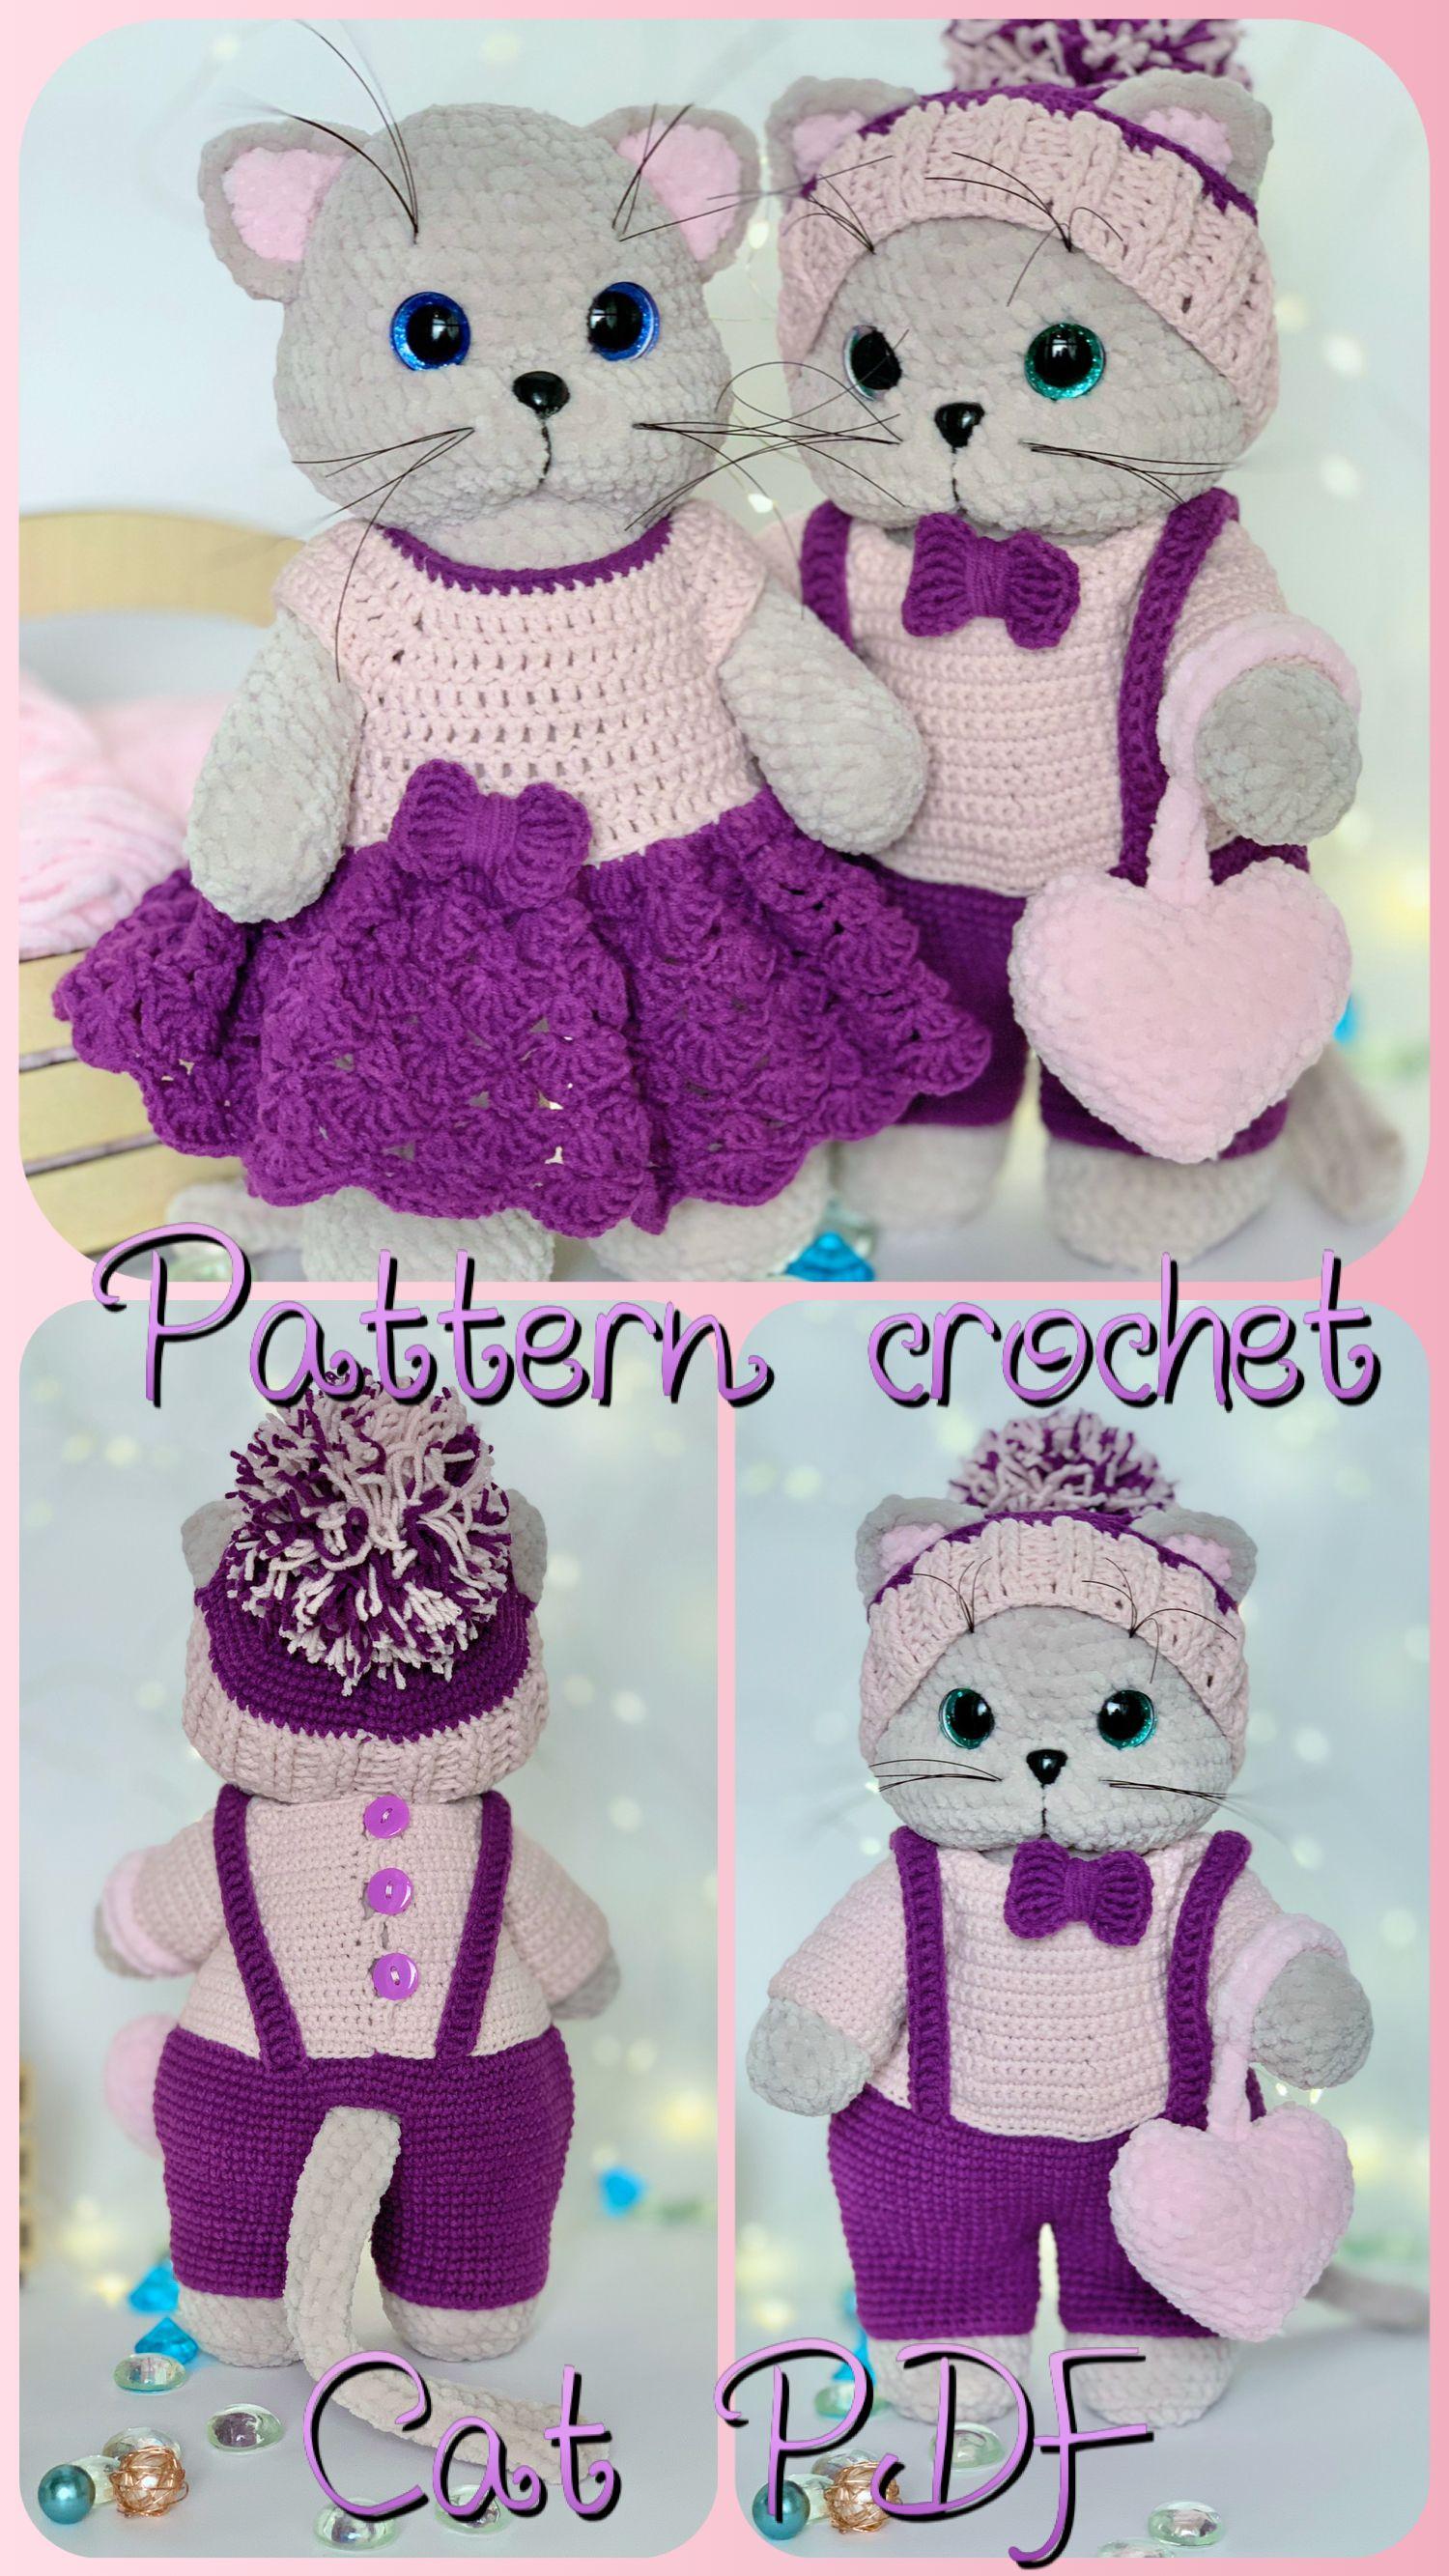 Cat crochet pattern amigurumi plush toy Etsy in 2020